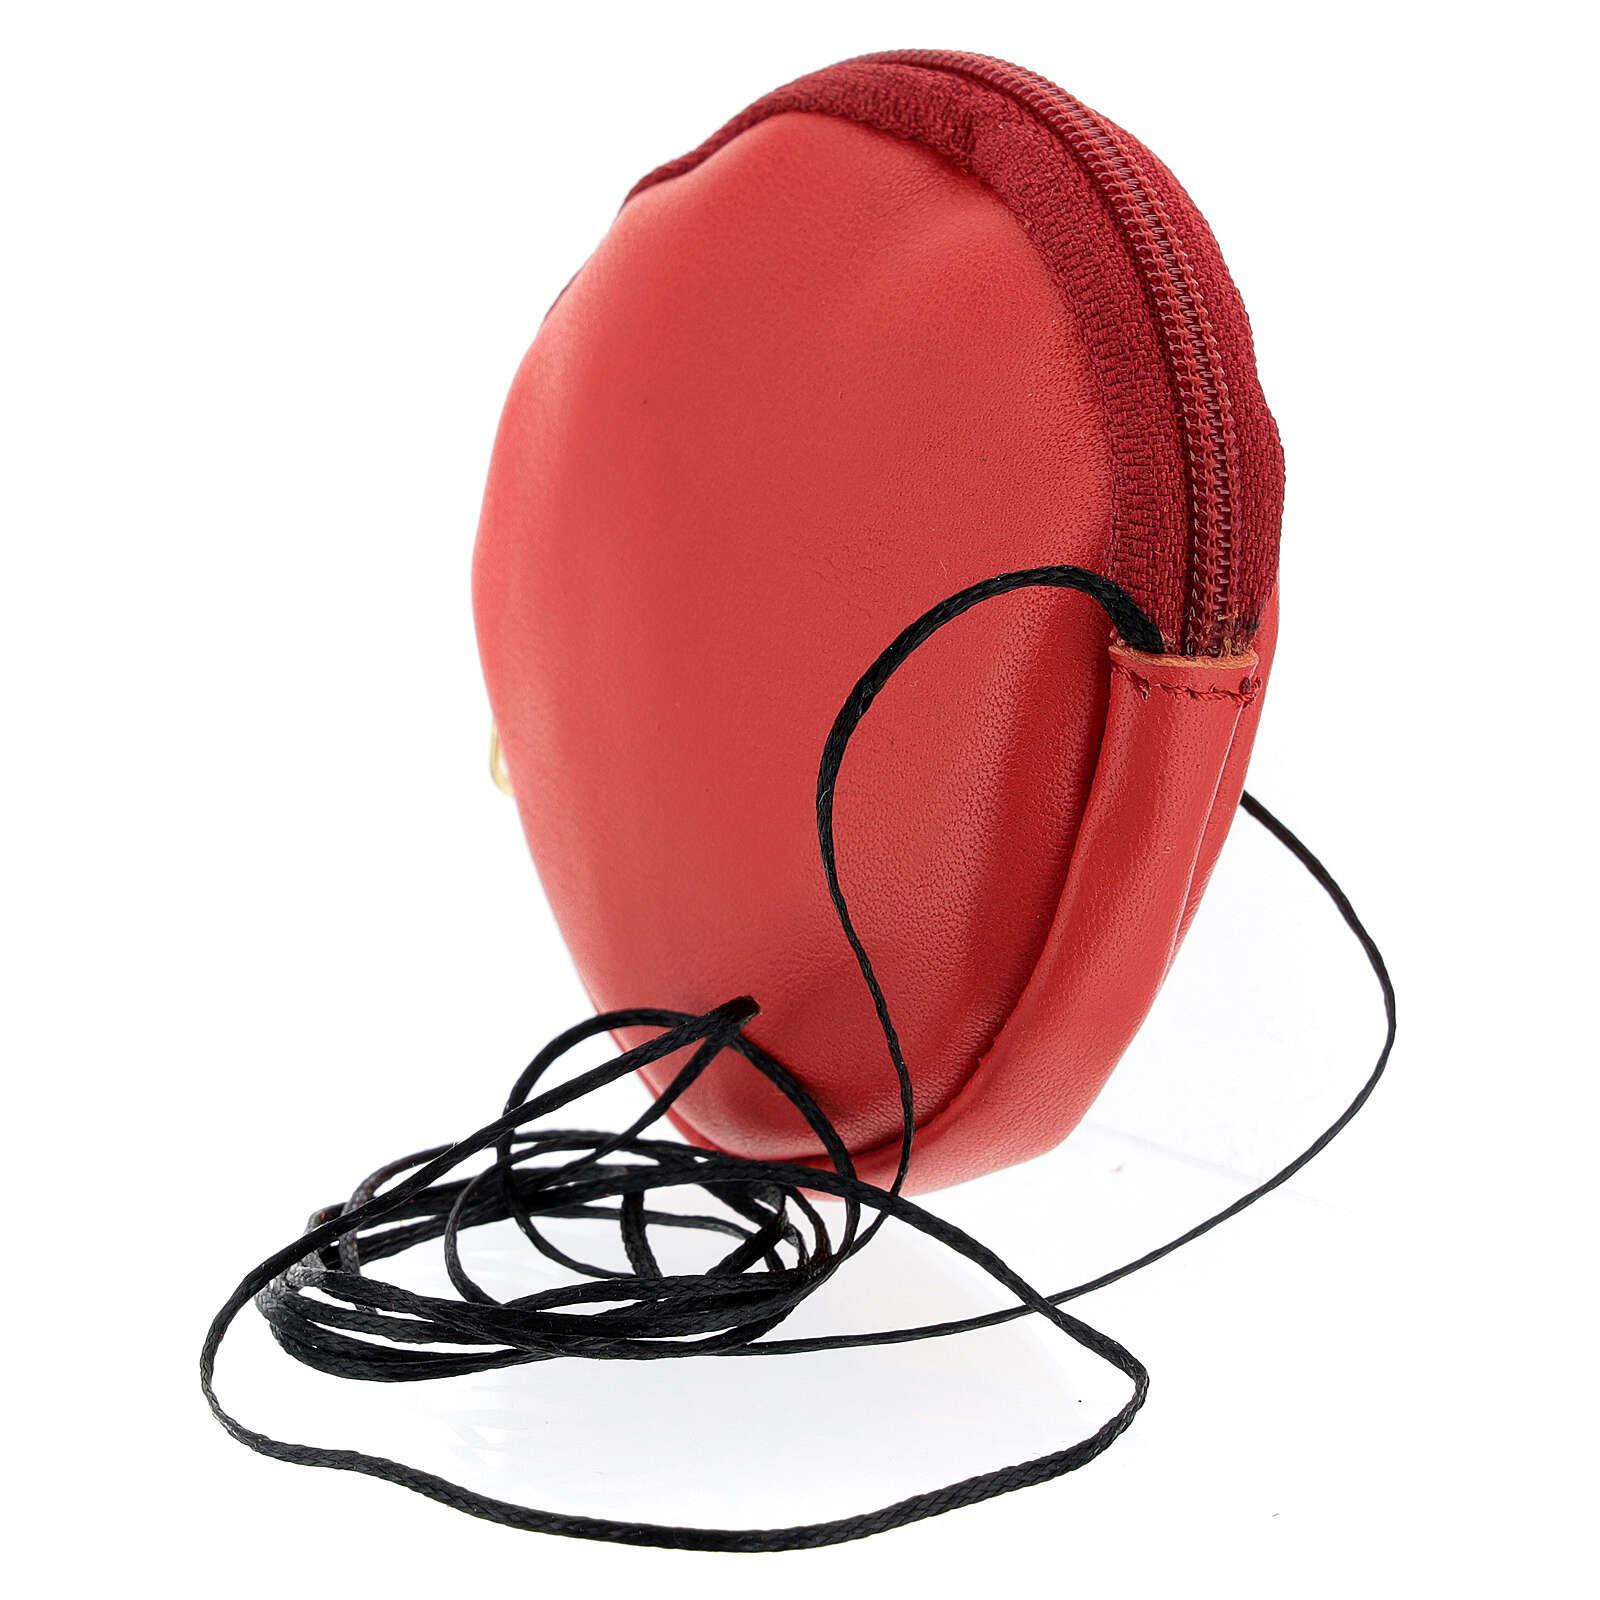 Astuccio portateca vera pelle rossa croce 8 cm 3